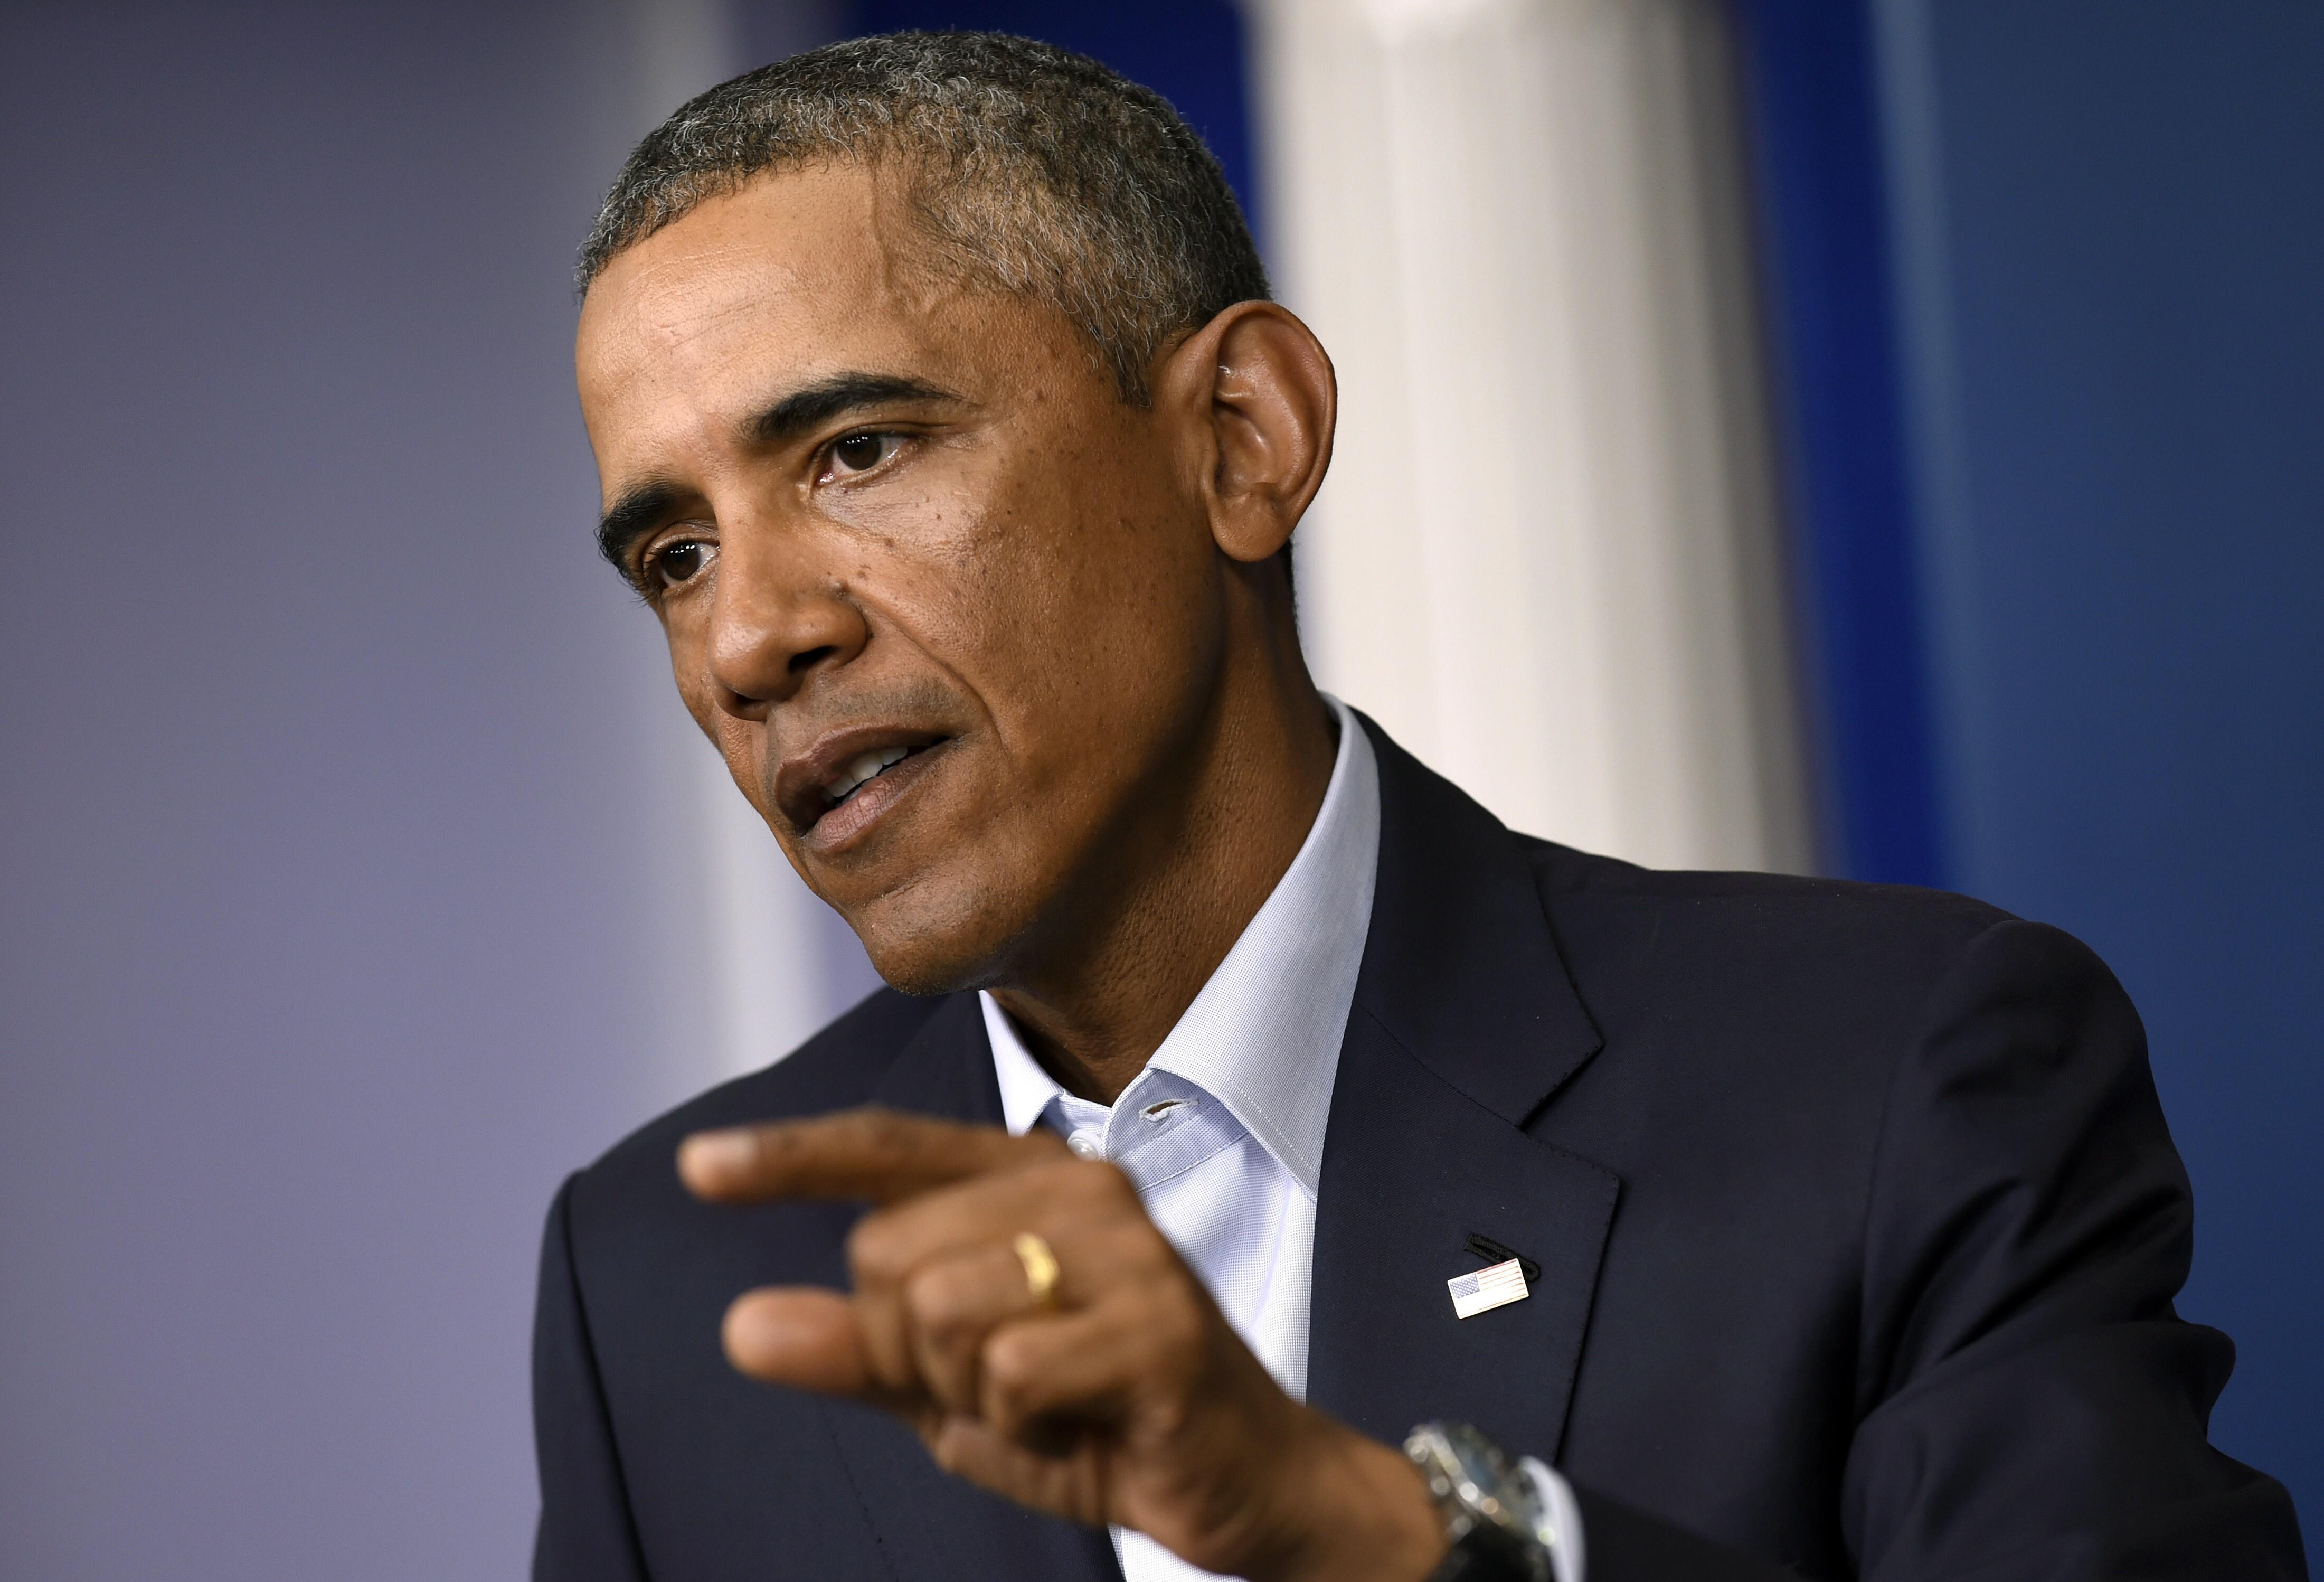 Obama loses again